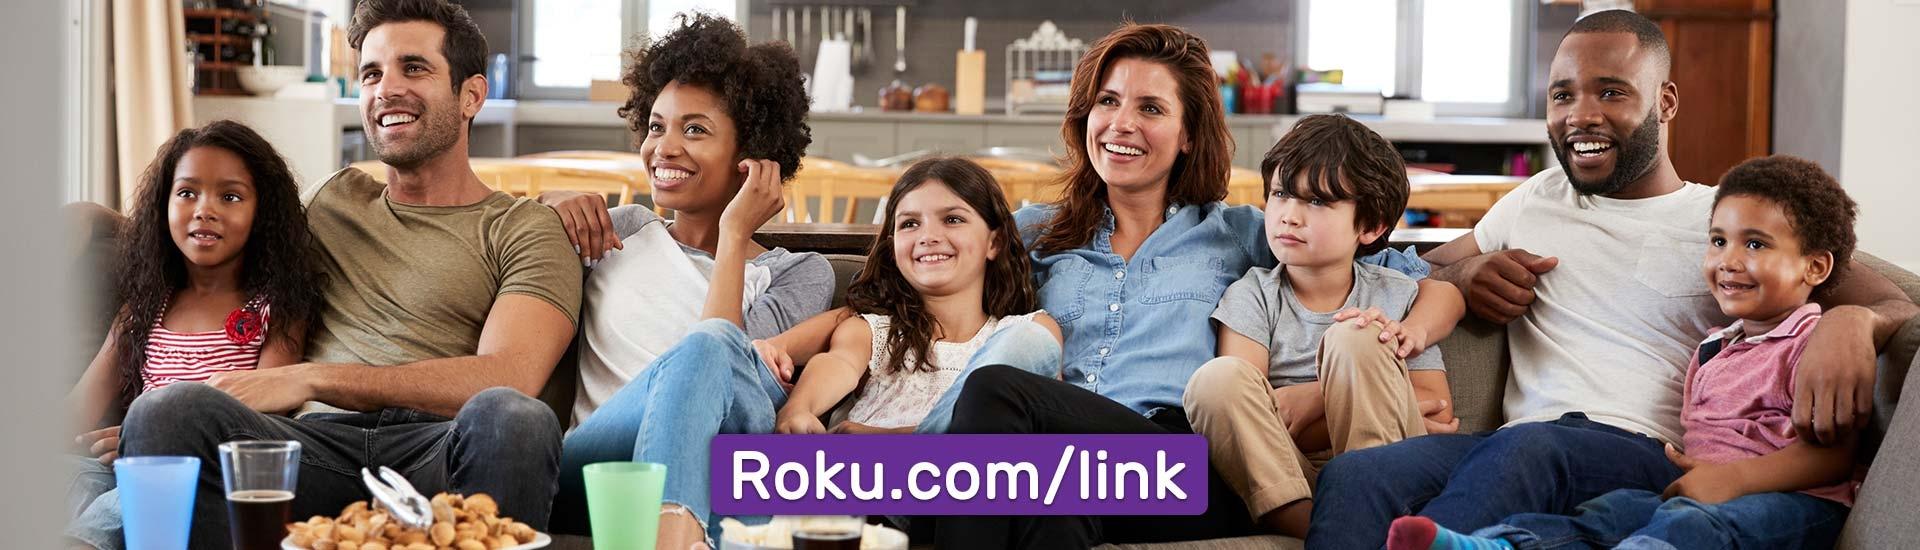 Roku.com/link (@myrokulinkcode) Cover Image